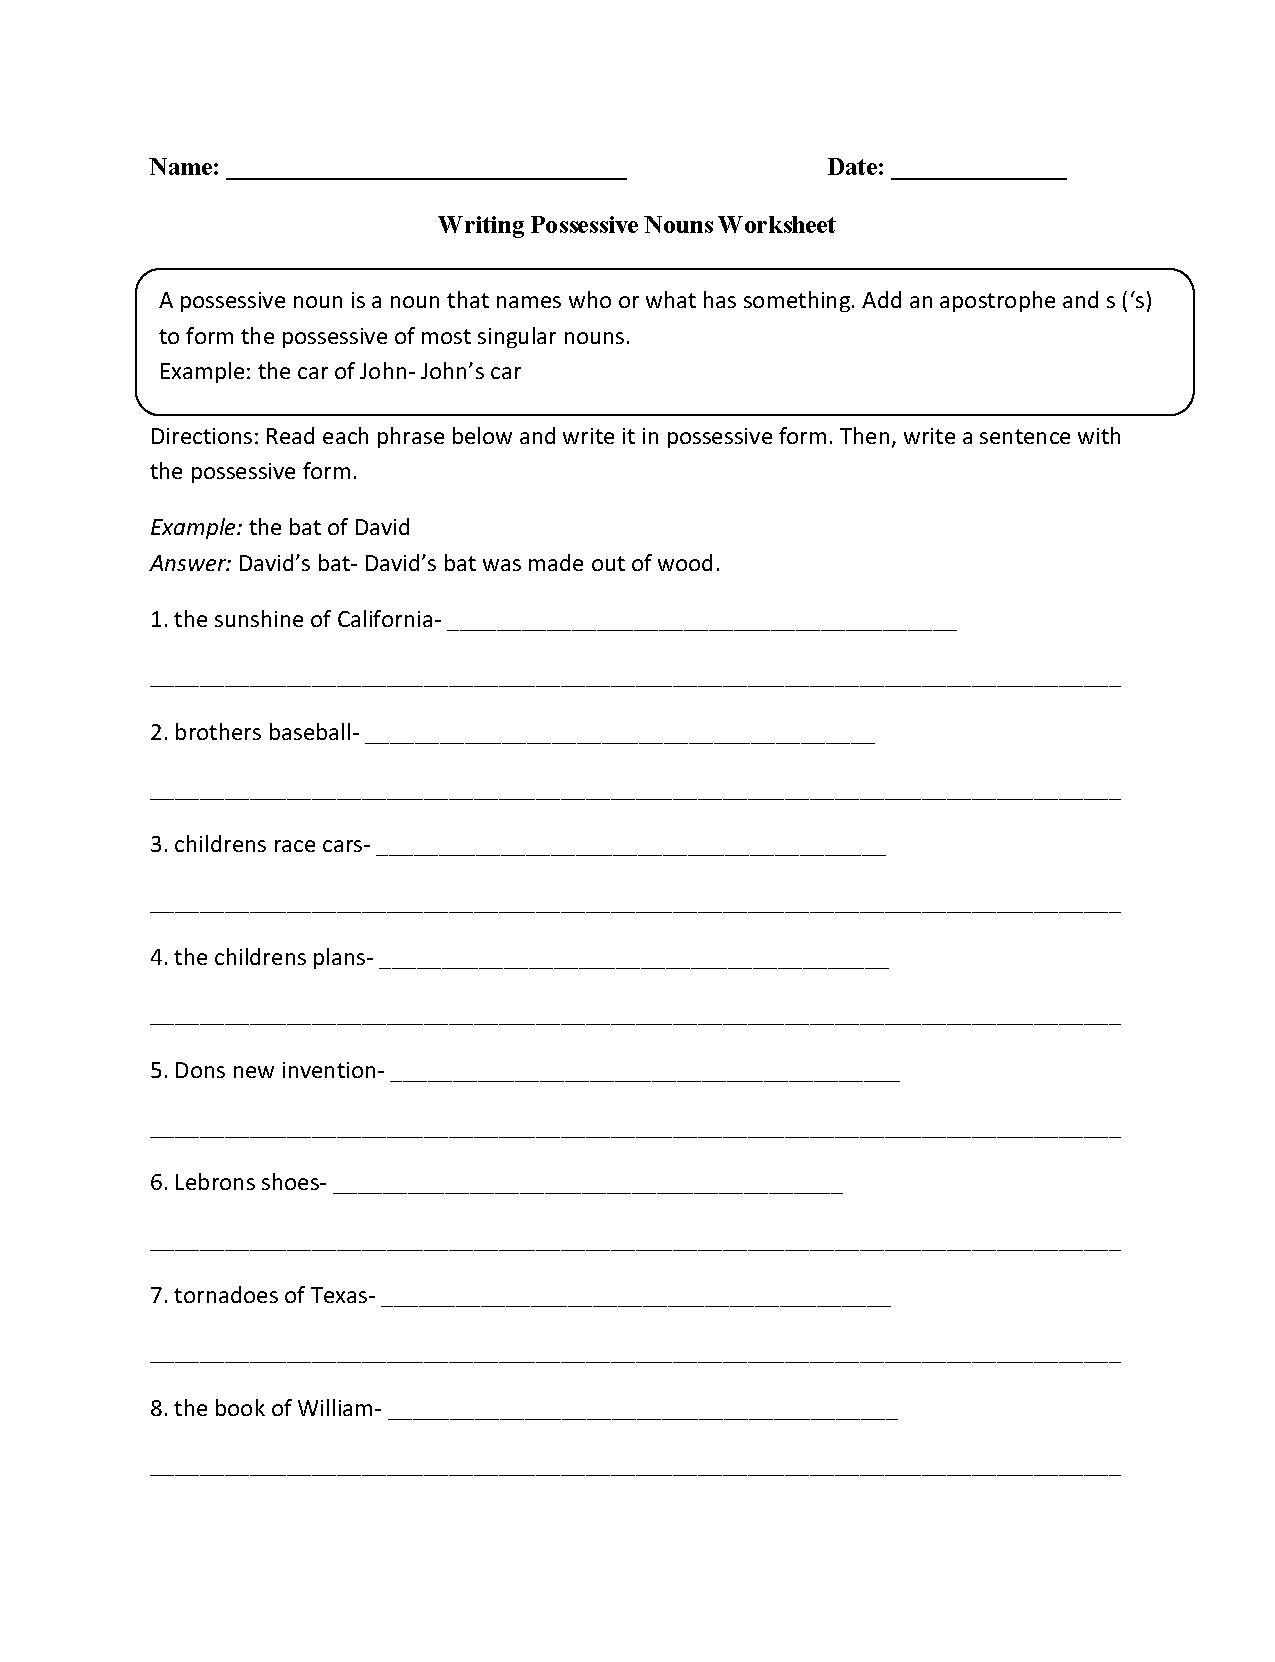 Nouns Worksheets   Possessive Nouns Worksheets - Free Printable Possessive Nouns Worksheets